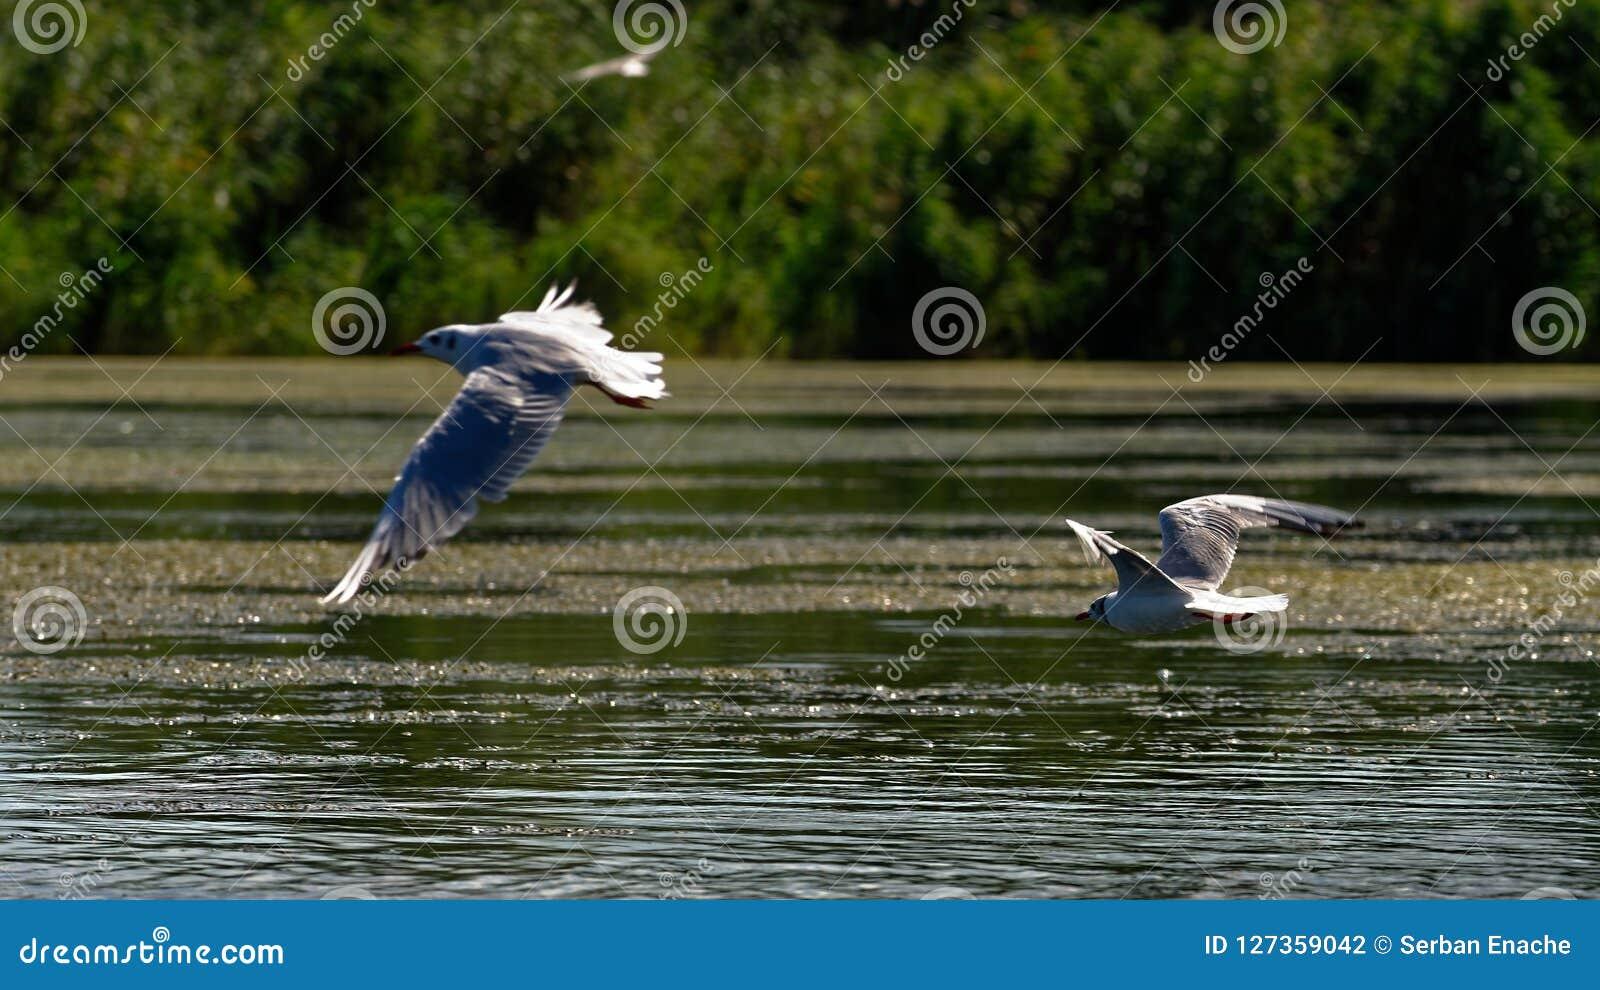 Seagulls του Queensland mooloolaba ακτών της Αυστραλίας πετώντας που λαμβάνεται ηλιοφάνεια